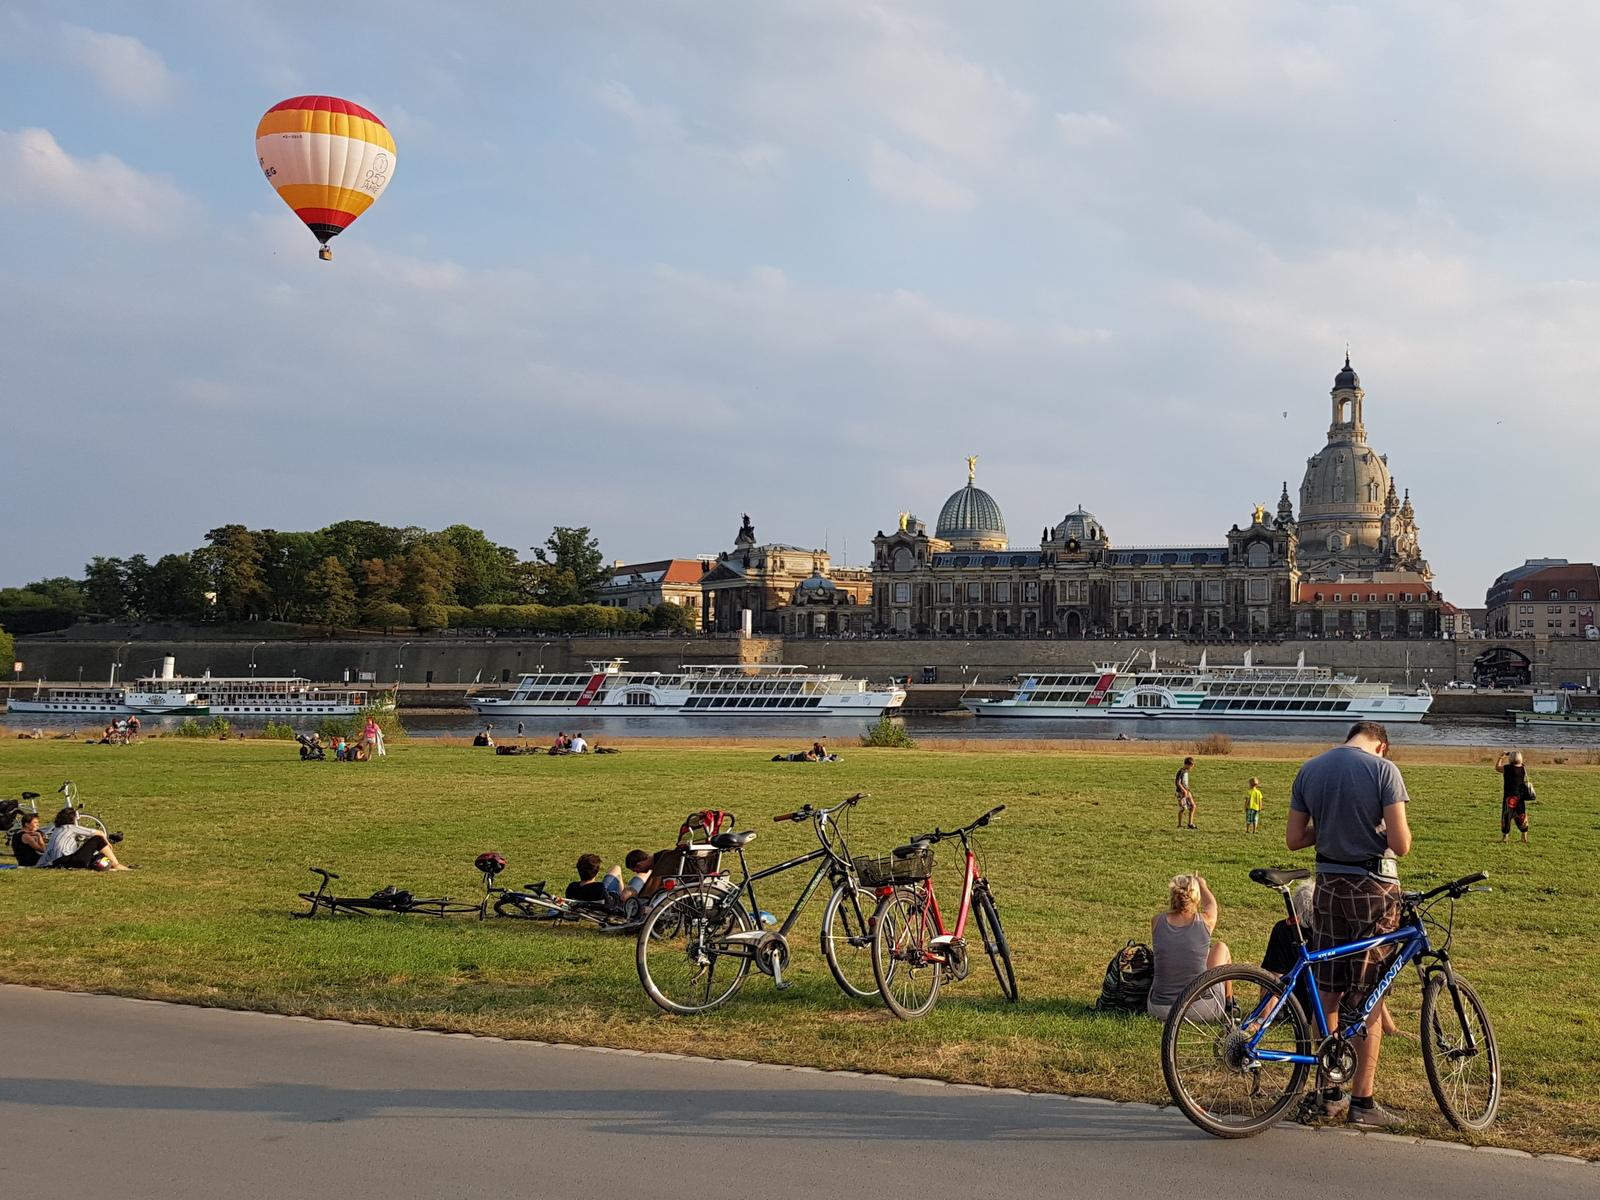 Dresden per Fahrrad, das ist echter Hochgenuss